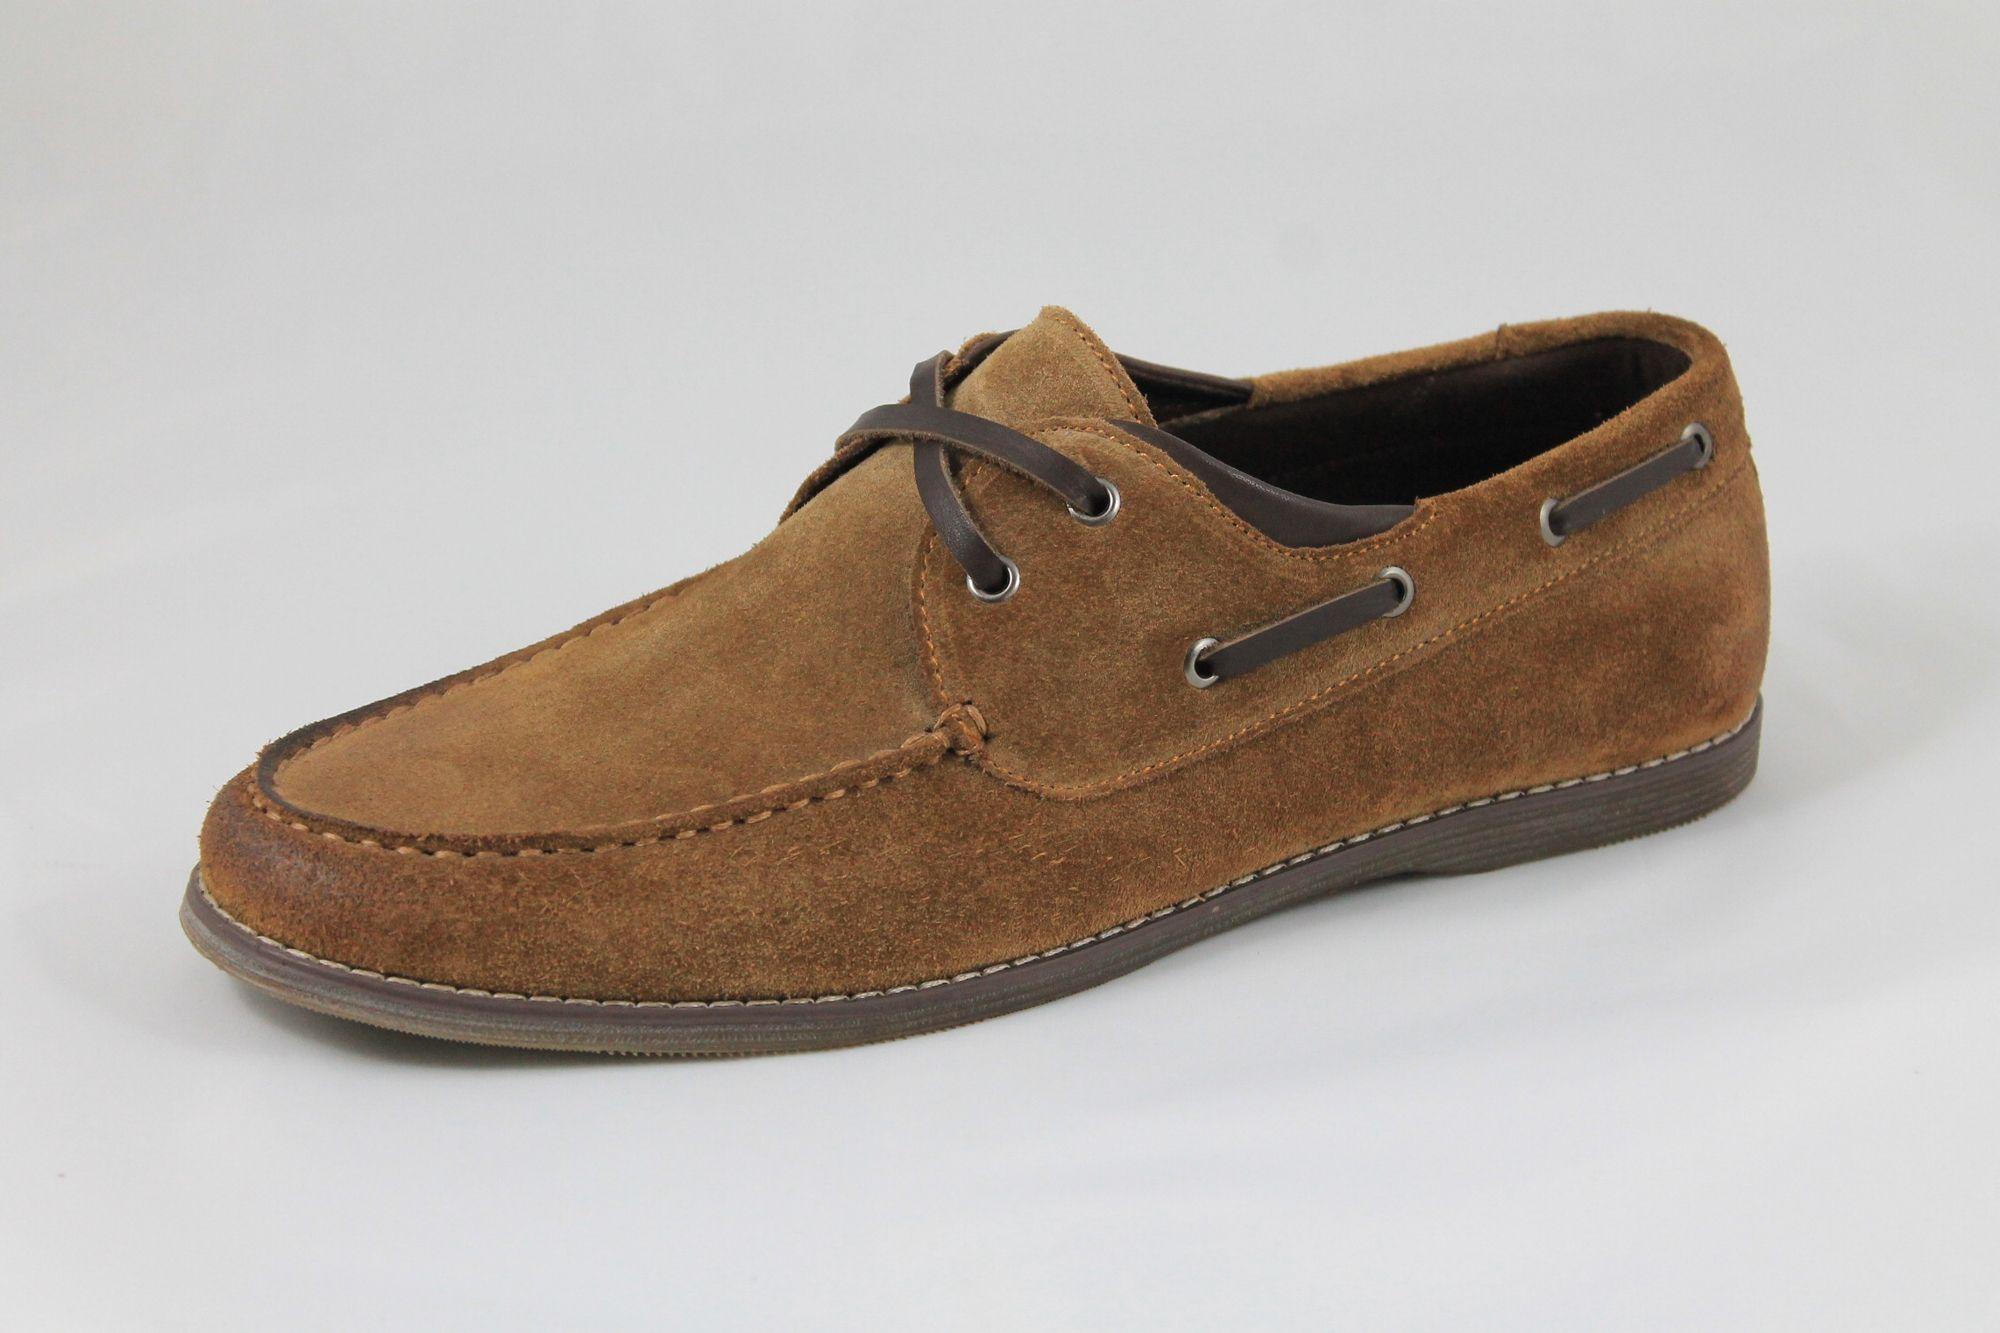 9fb98398c سعر Shoebox Nubuck Casual Shoes - Camel فى مصر | جوميا | أحذية | كان ...